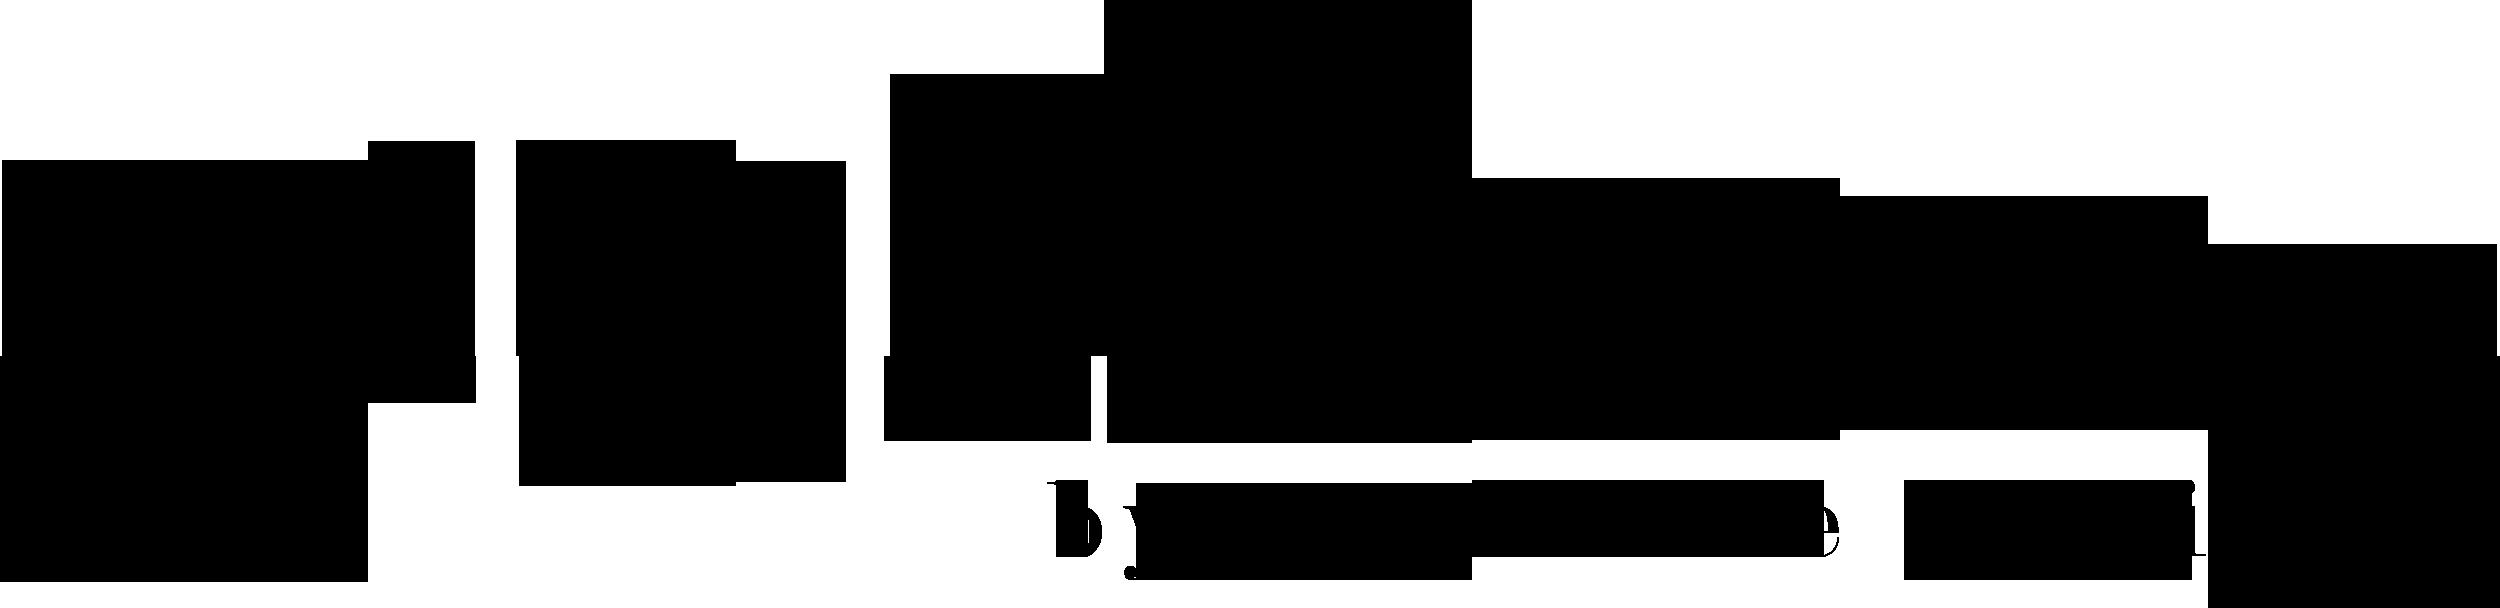 apothecary-by-taramarie-perri_logo_black-moon_v2.png